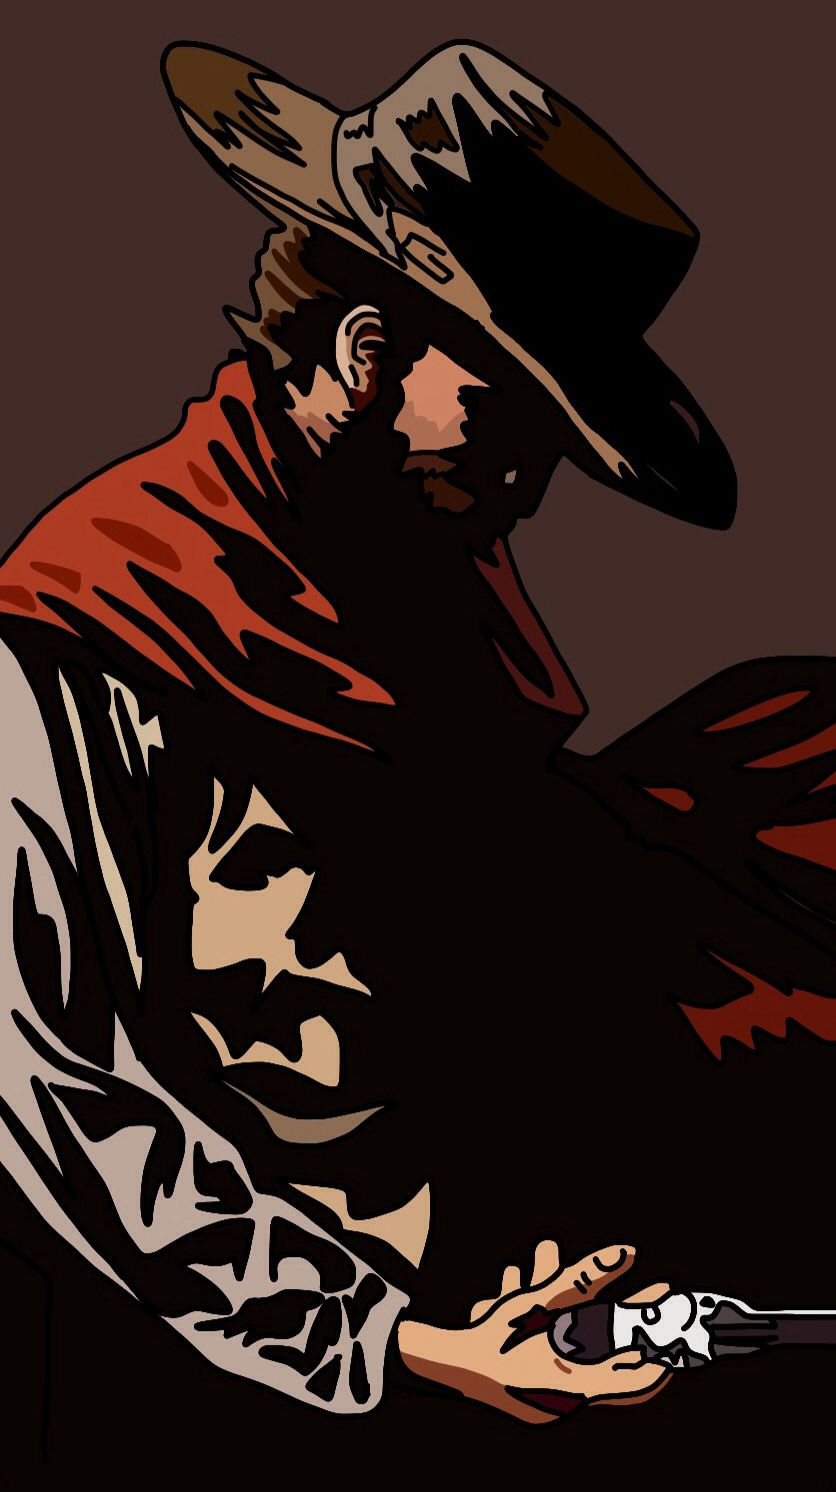 836x1492 Western, Clint Eastwood, Art, Illustration, Movie, Film Drawings